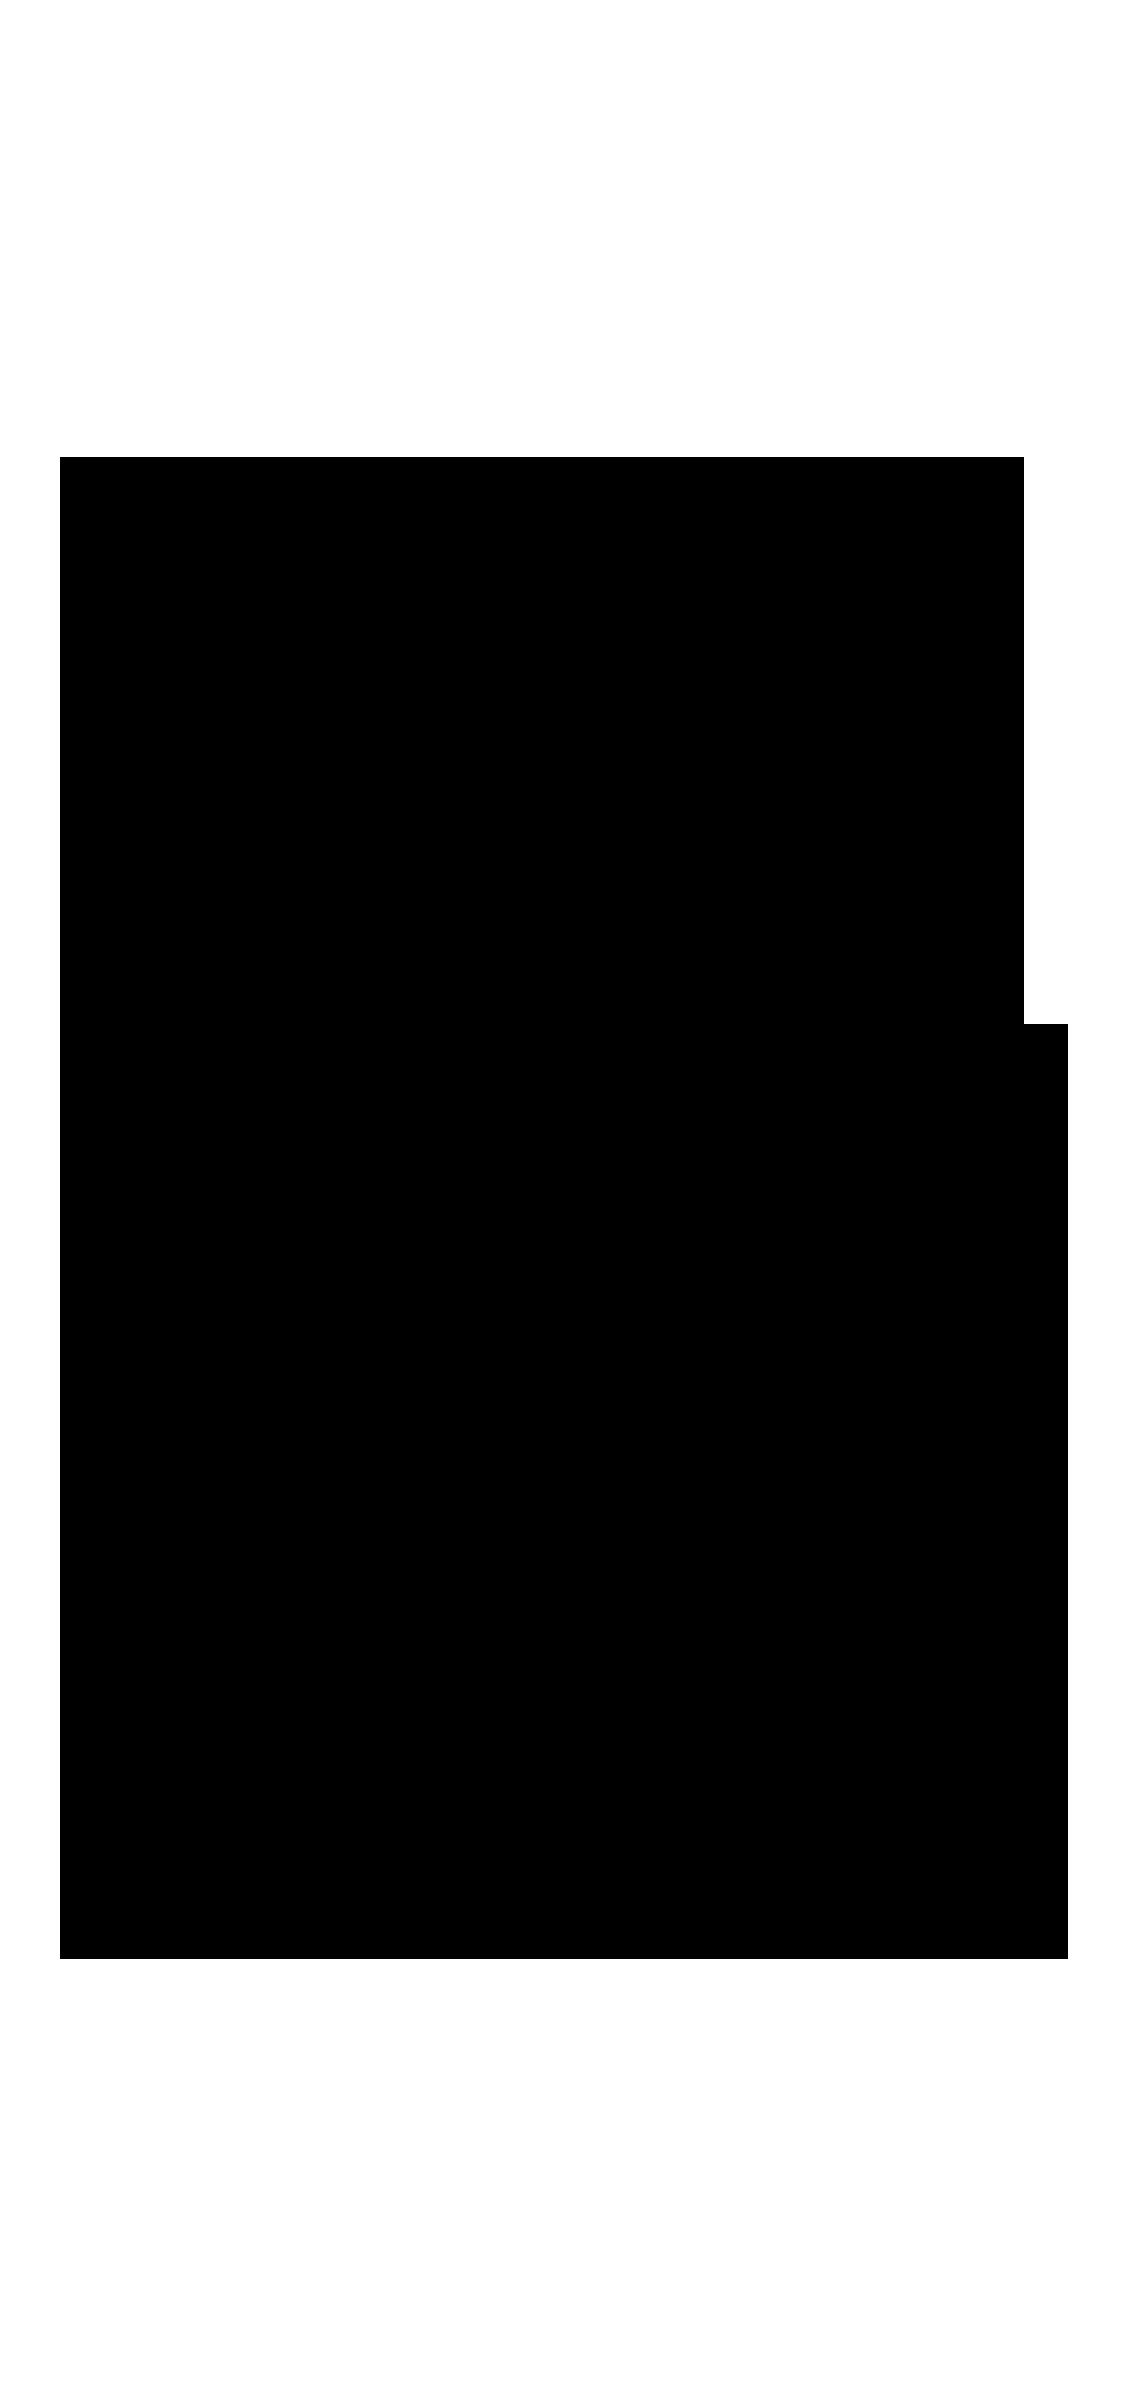 Protostar